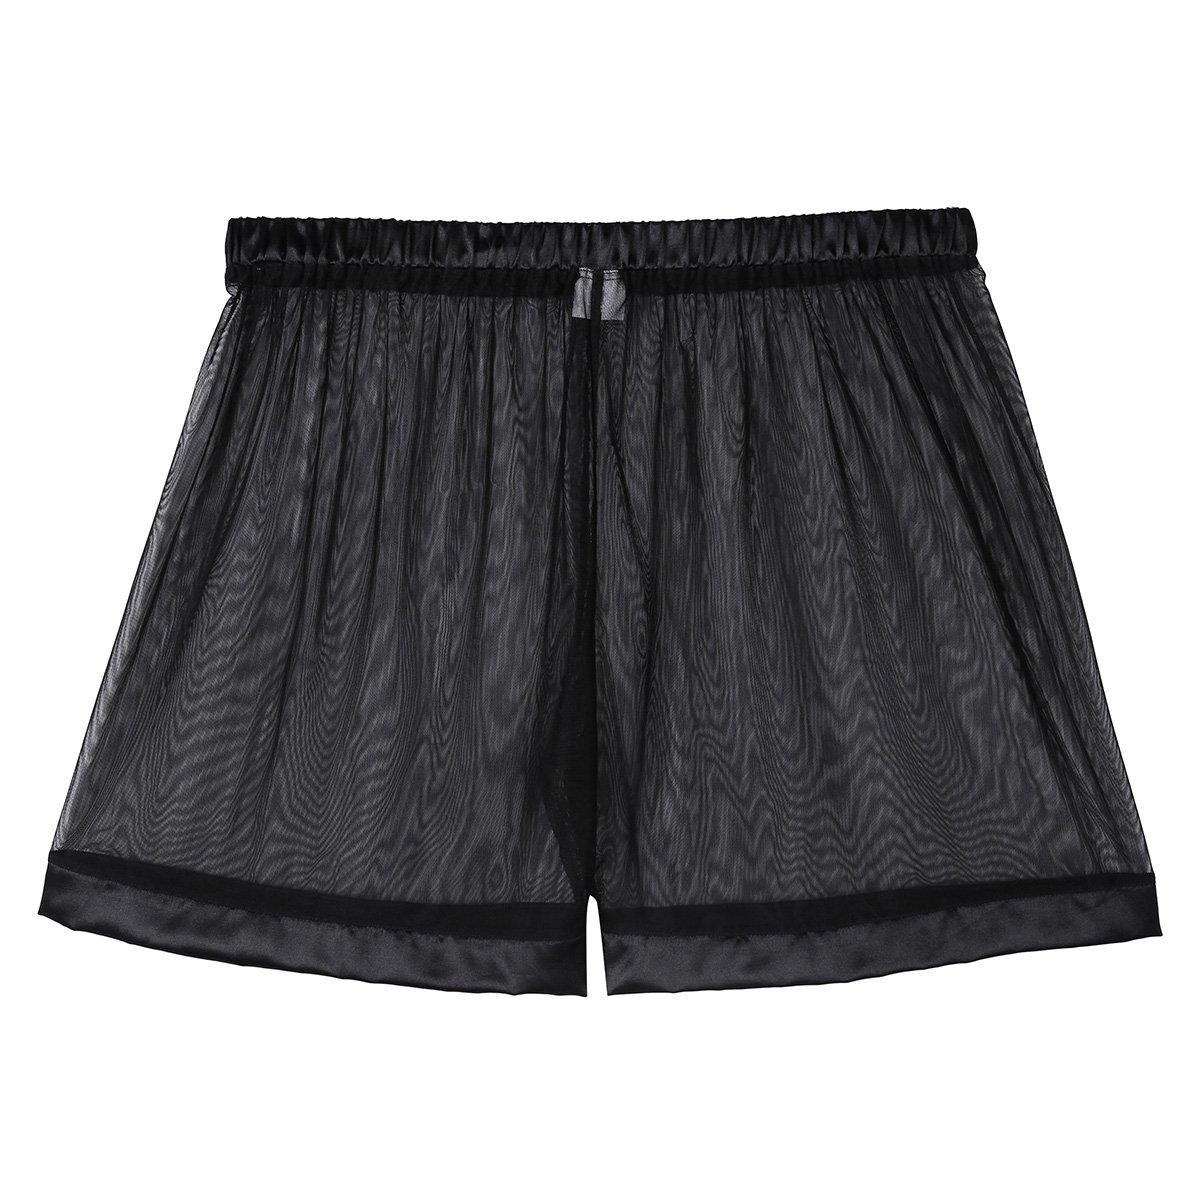 Alvivi Mens Mesh See-Through Loose Lounge Boxer Shorts Underwear